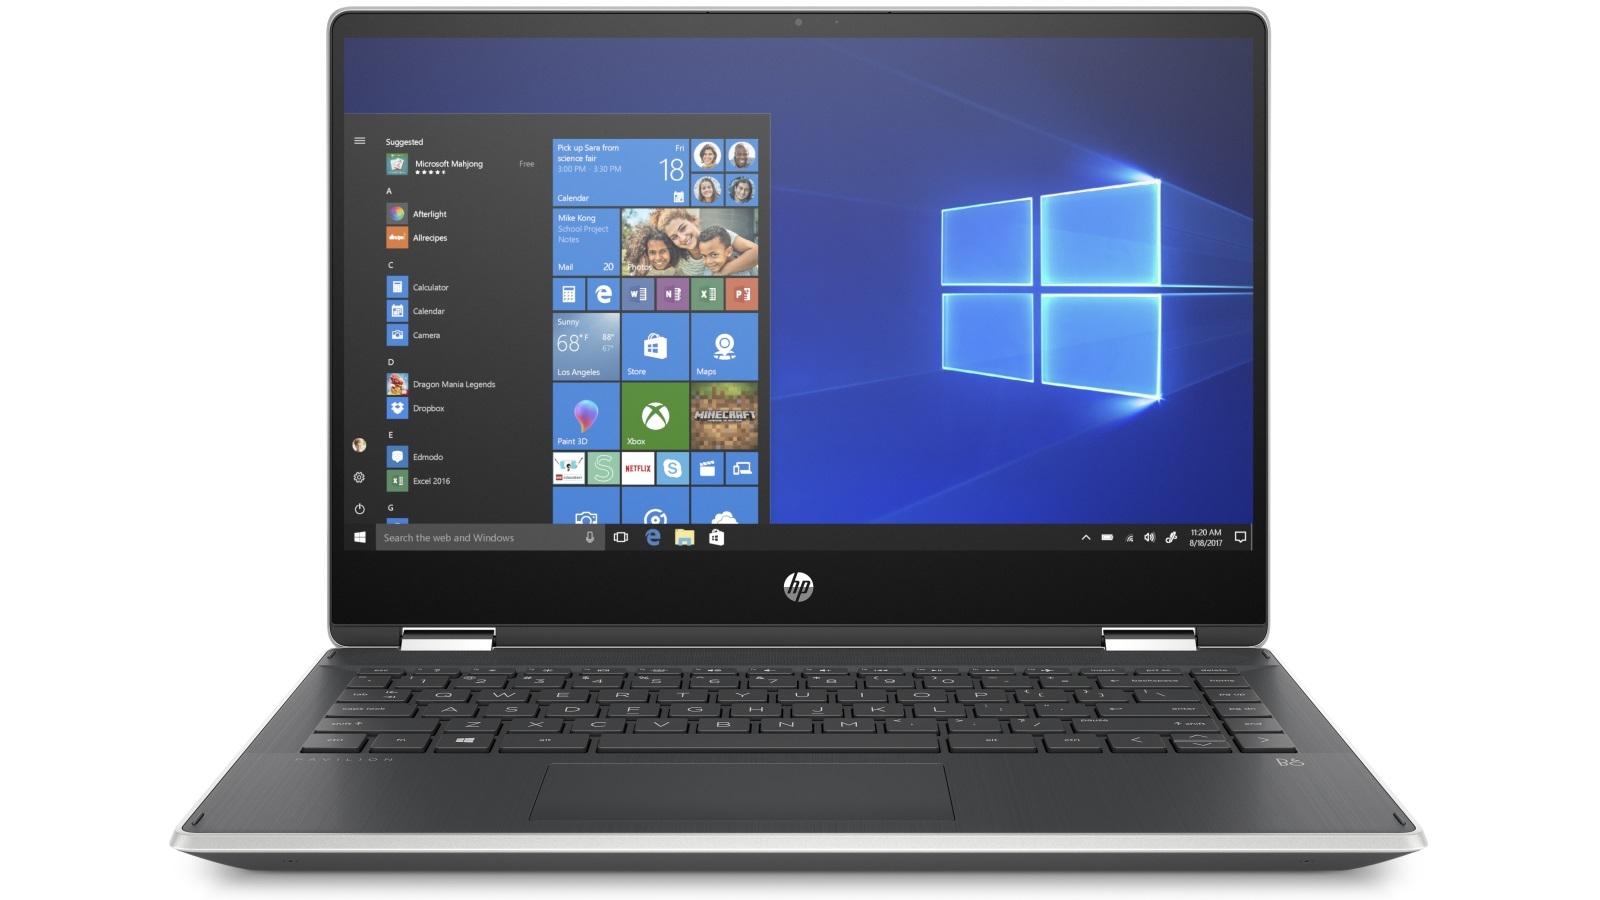 HP Pavilion X360 14-DH0018TU 2-in-1 Laptop